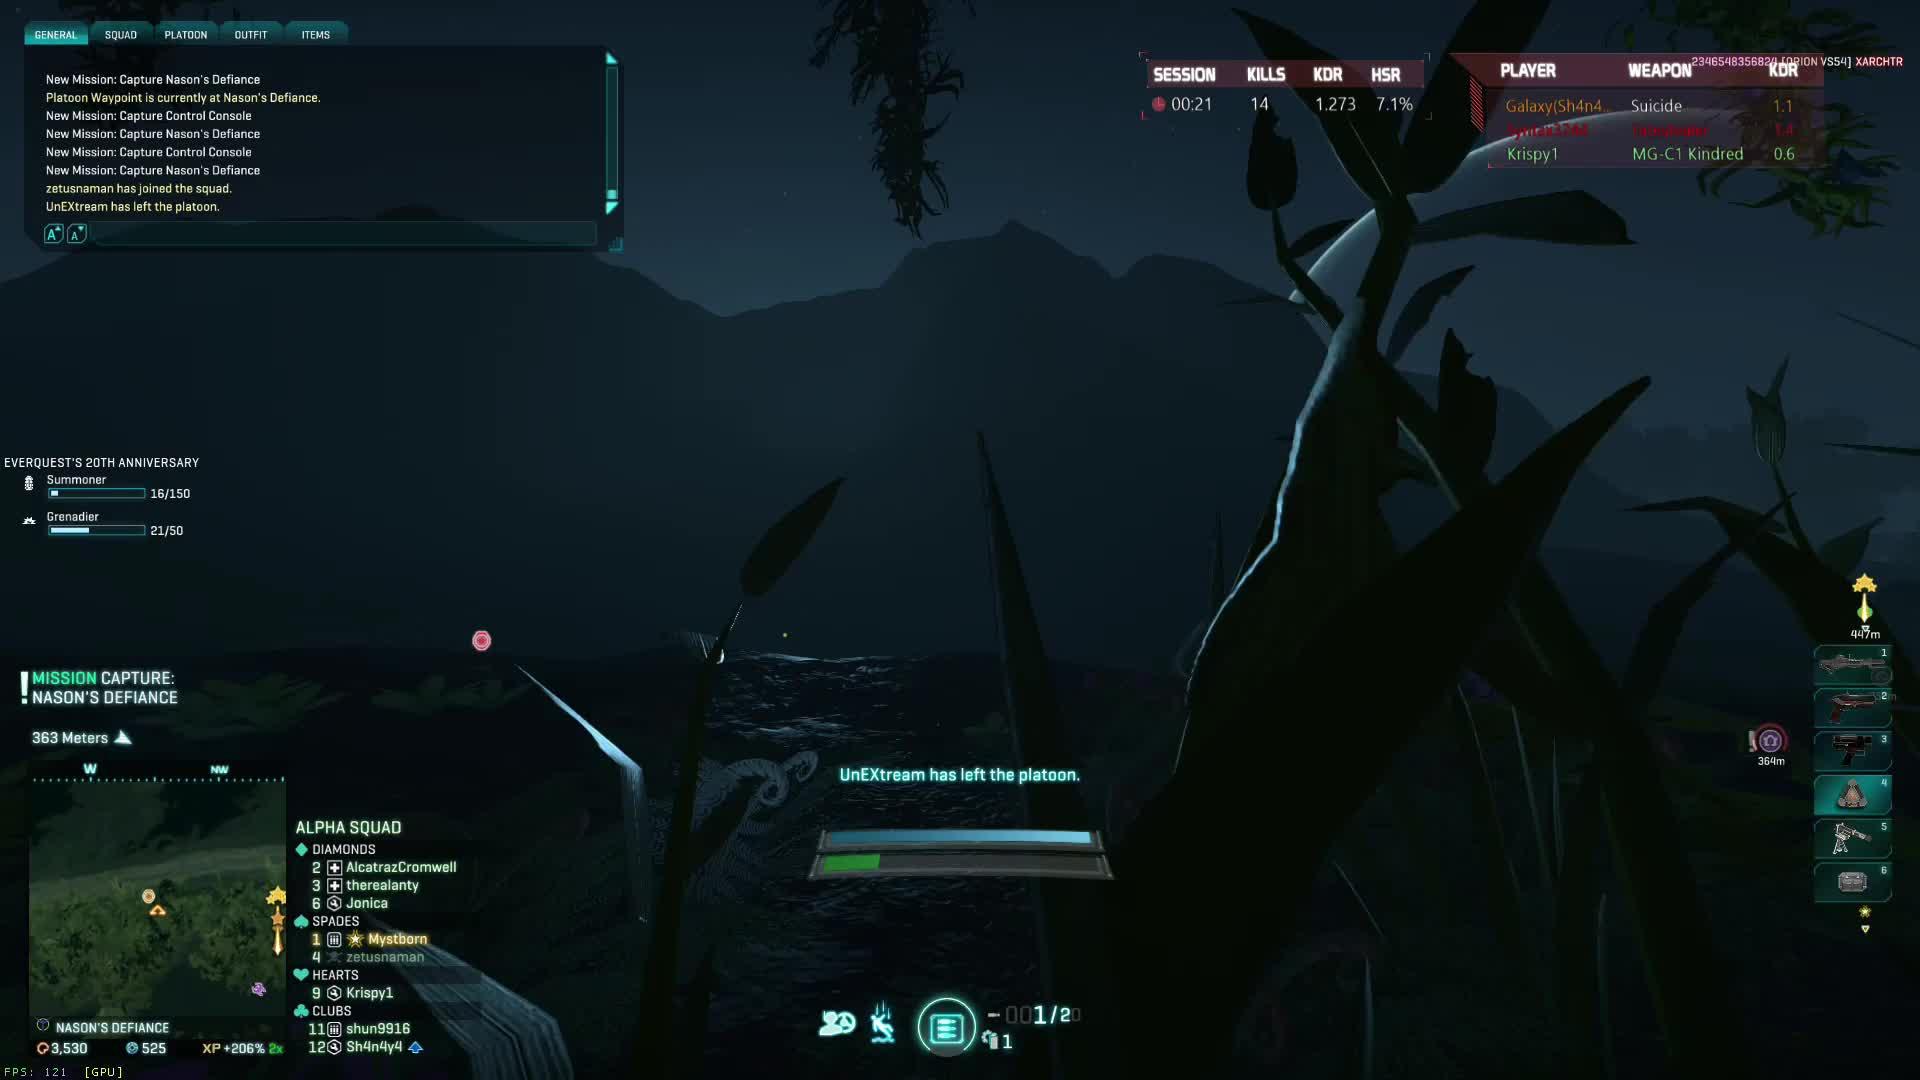 Briggs, Planetside, Tactics GIFs